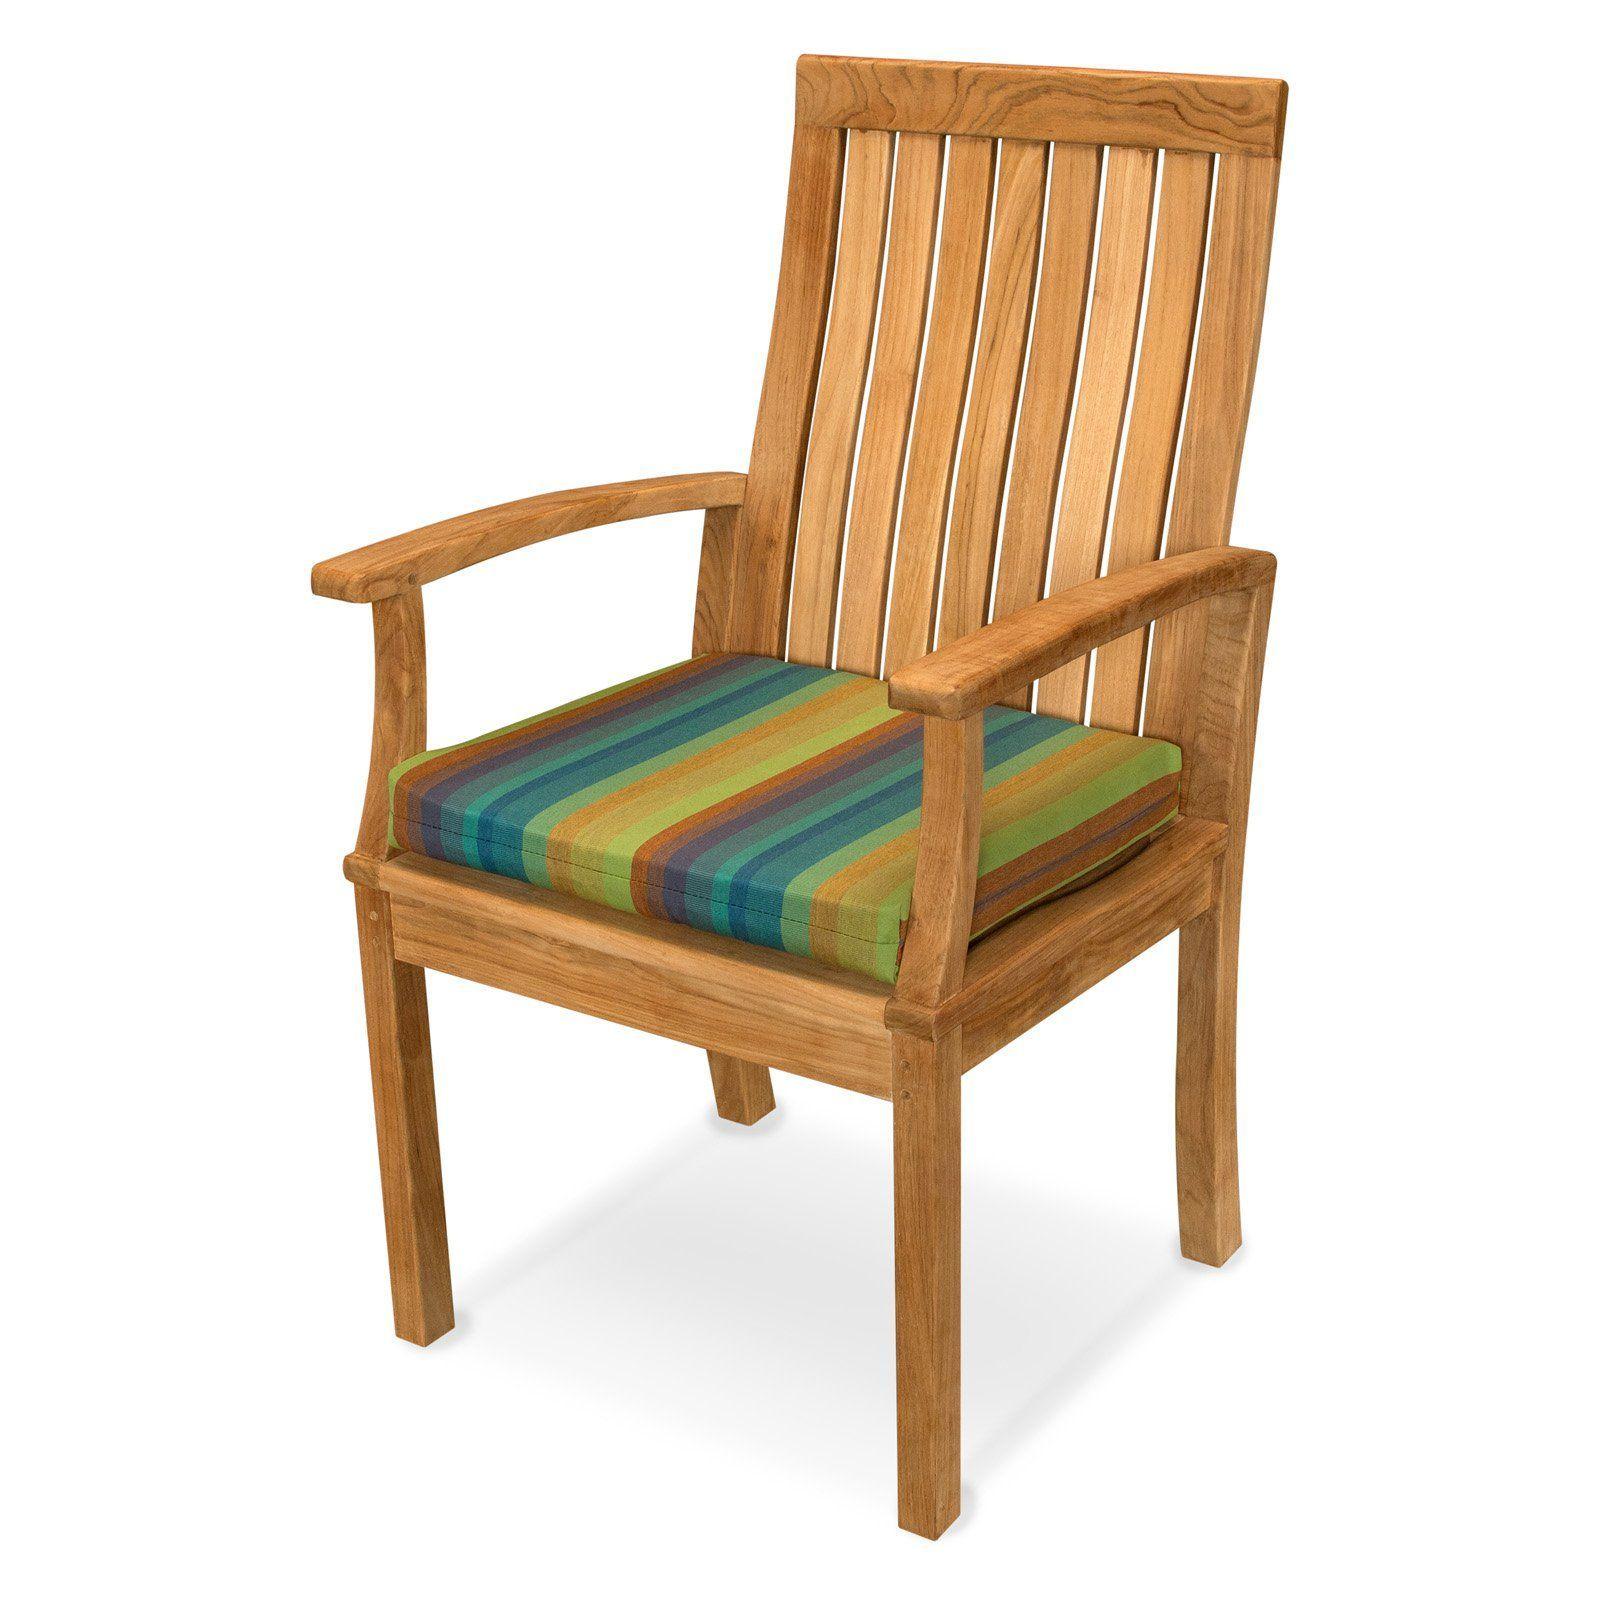 Ateeva Sunbrella Striped 18 X 19 In Outdoor Rocker Seat Cushion From Hayneedle